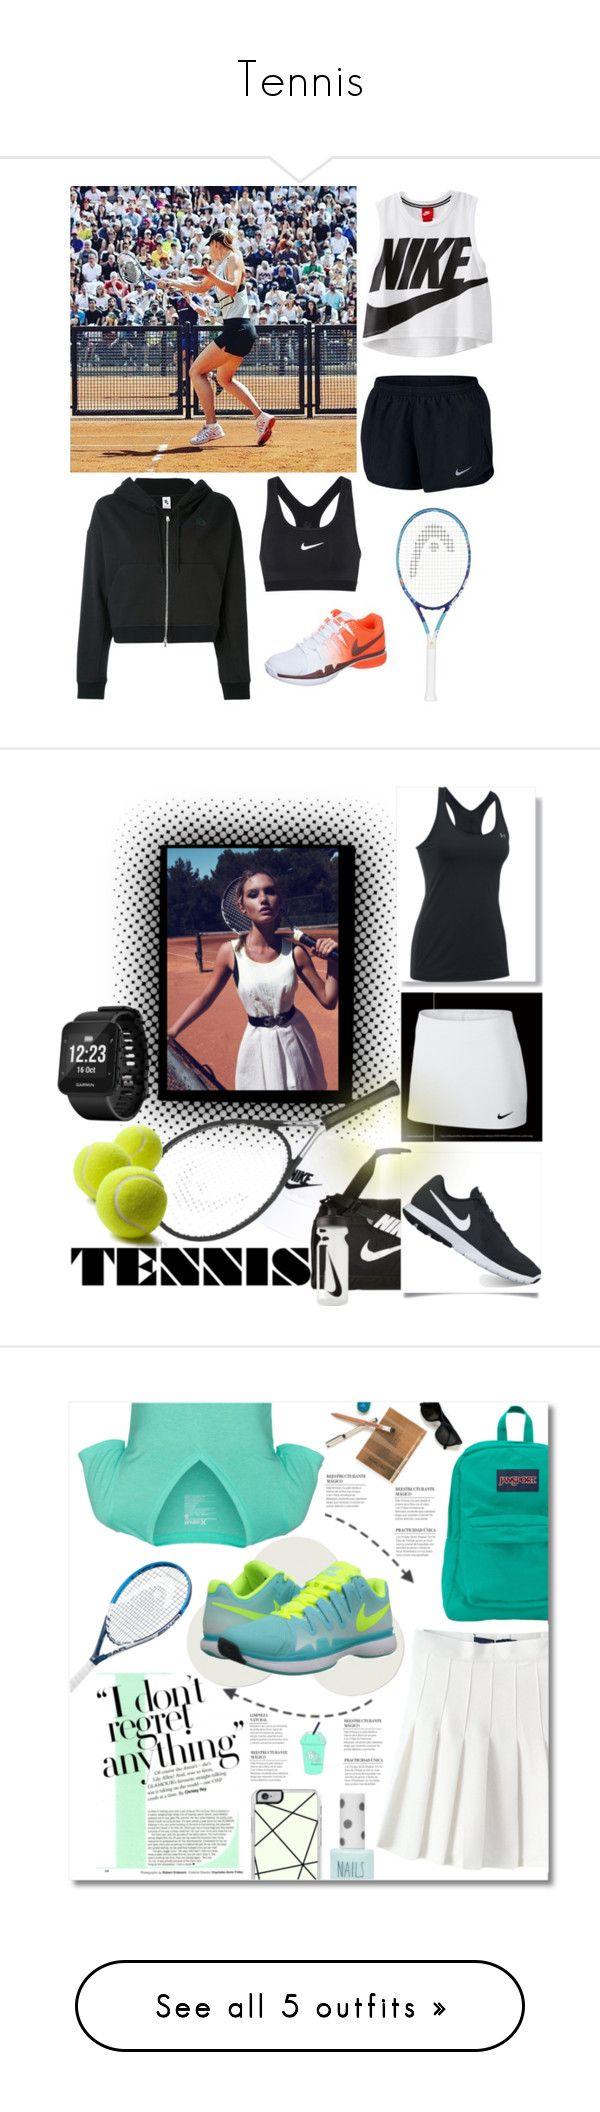 """Tennis"" by la-yuki ❤ liked on Polyvore featuring NIKE, Garmin, Hurley, JanSport, Maryam Keyhani, Topshop, Forever 21, New Balance, Chanel and adidas"